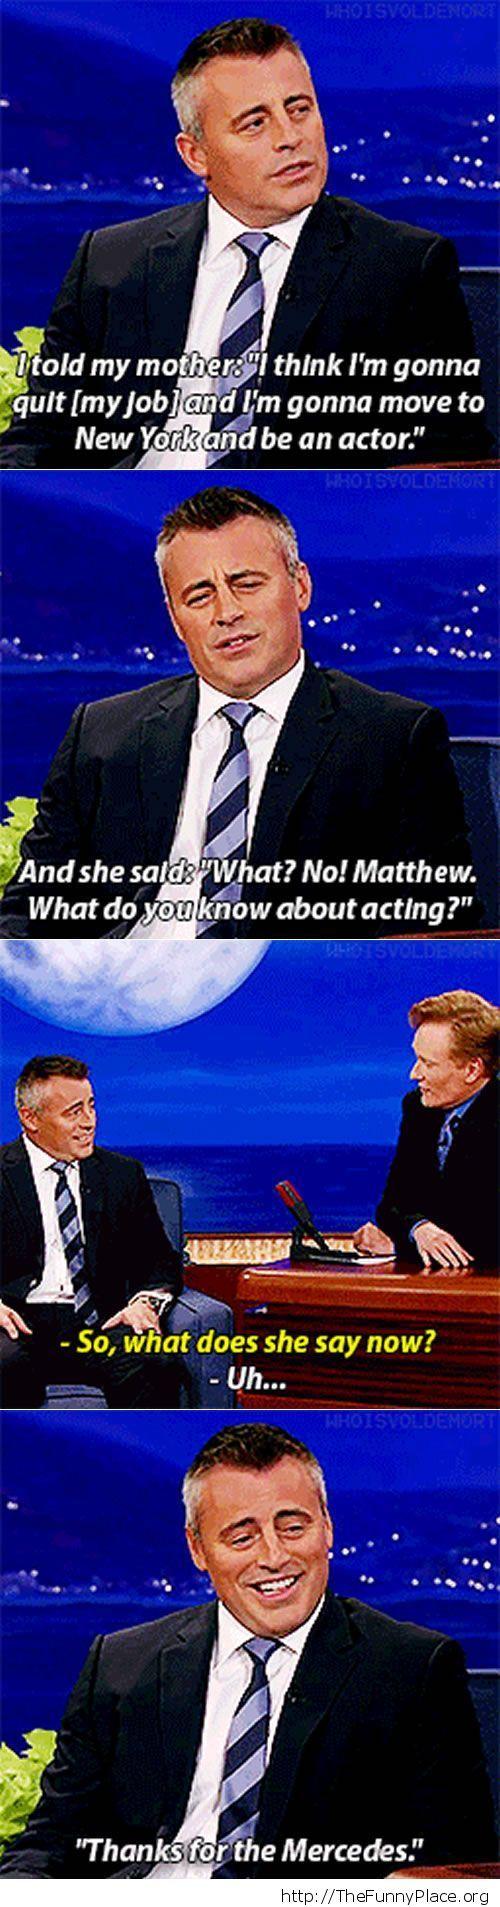 Matt LeBlanc about his mom